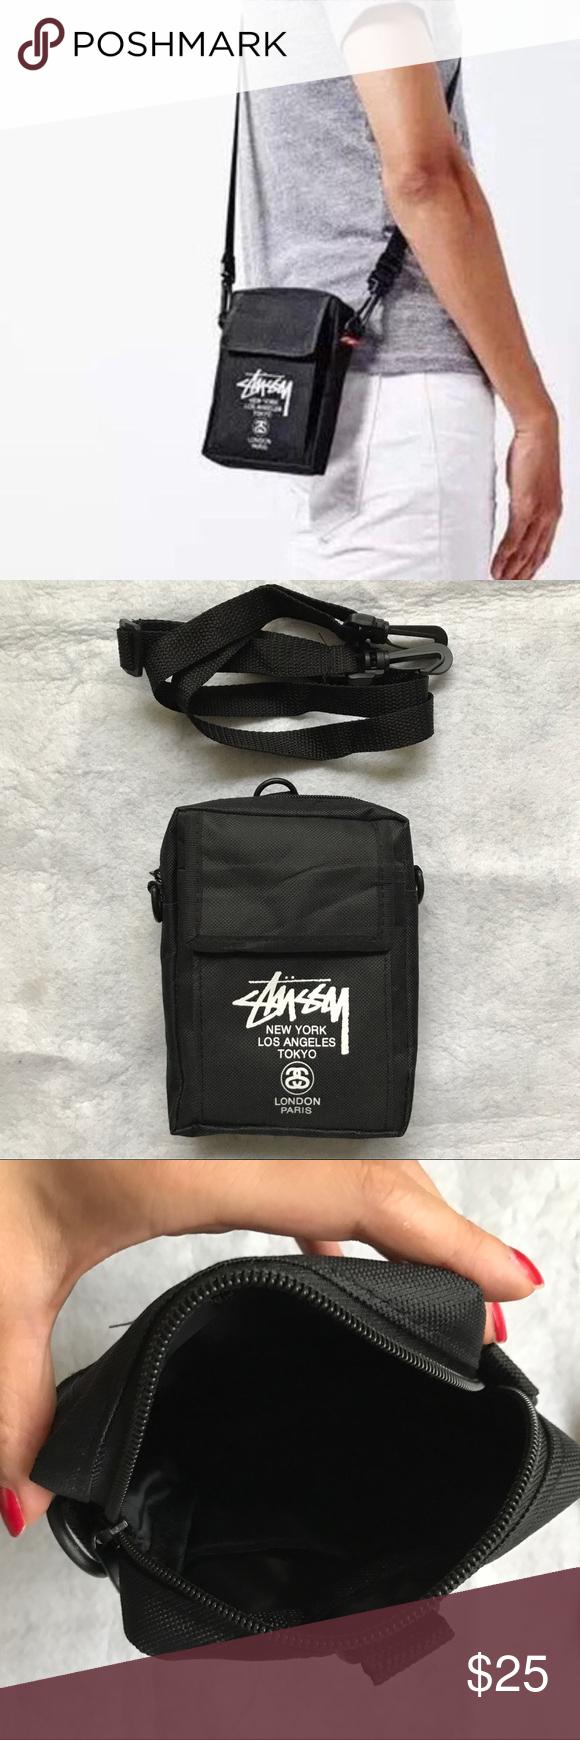 Stussy unisex Black Crossbody Pouch bag Authentic Stussy x Japan Smart  magazine collaboration Bag only NEW ed79c0822b51f